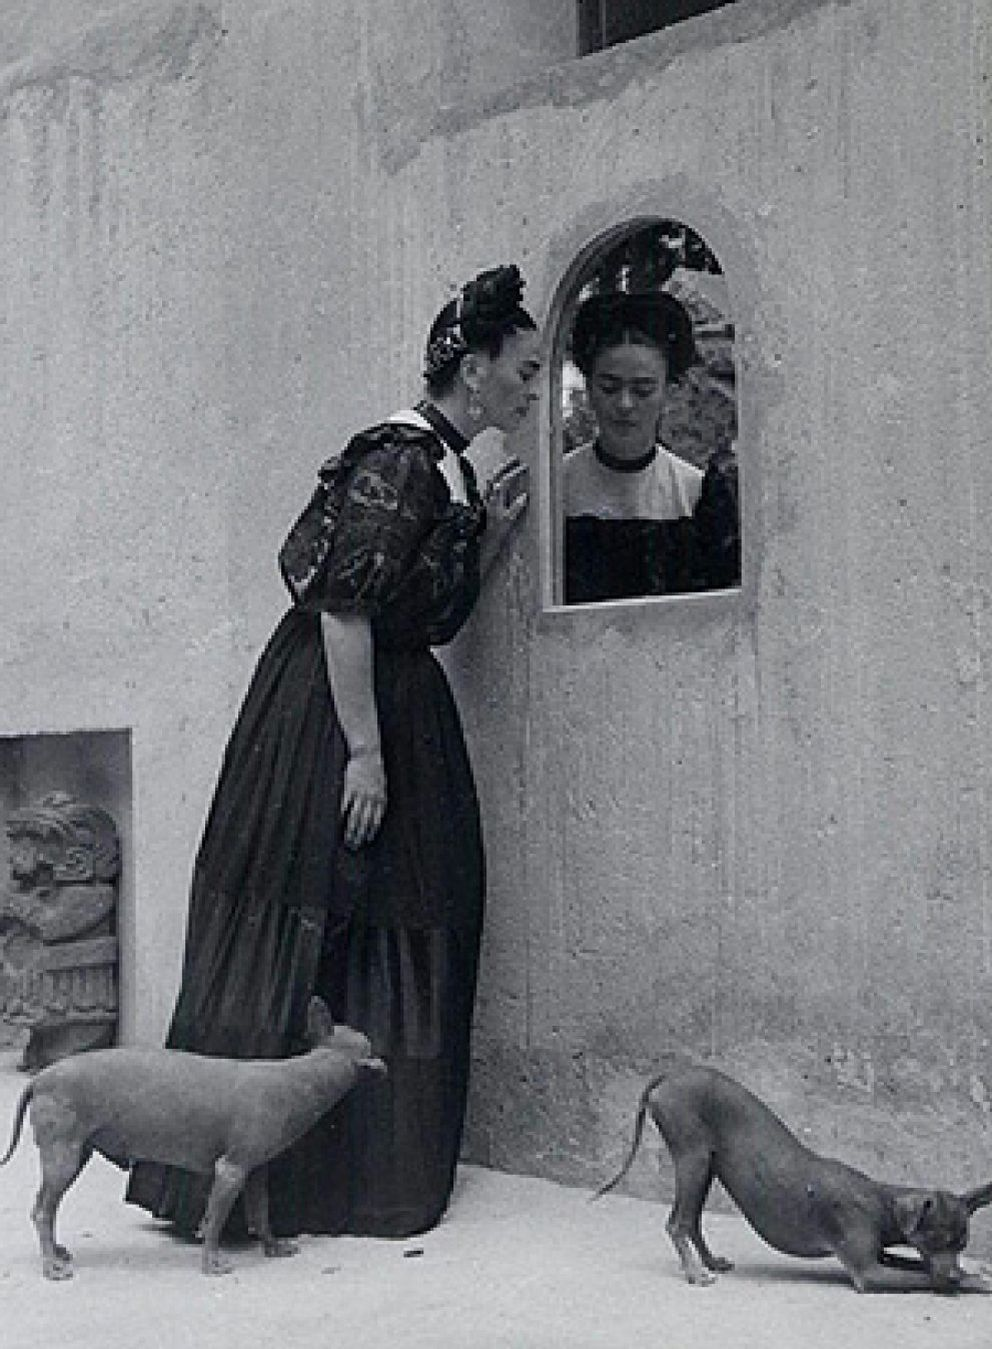 Arte la obra de frida kahlo recorrer europa en 2010 for Cuartos decorados de frida kahlo